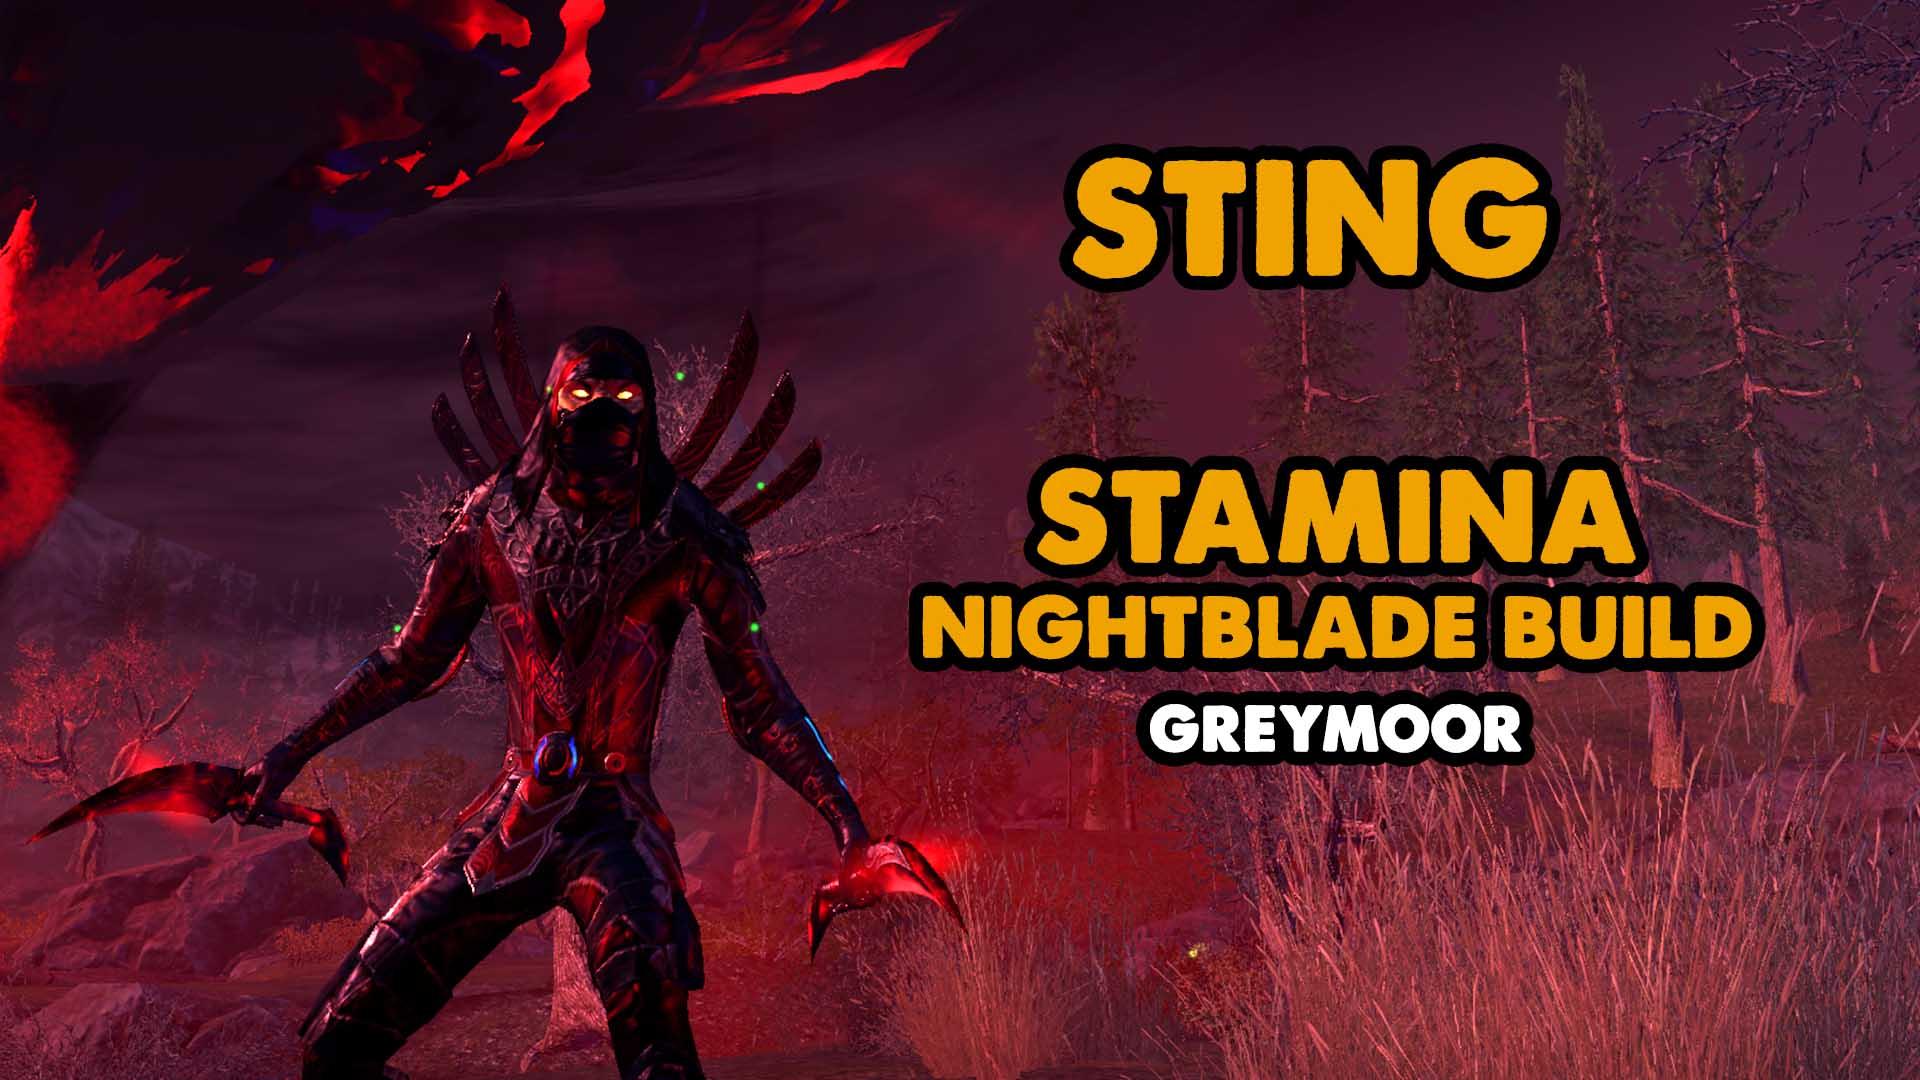 sting, nightblade, stamblade